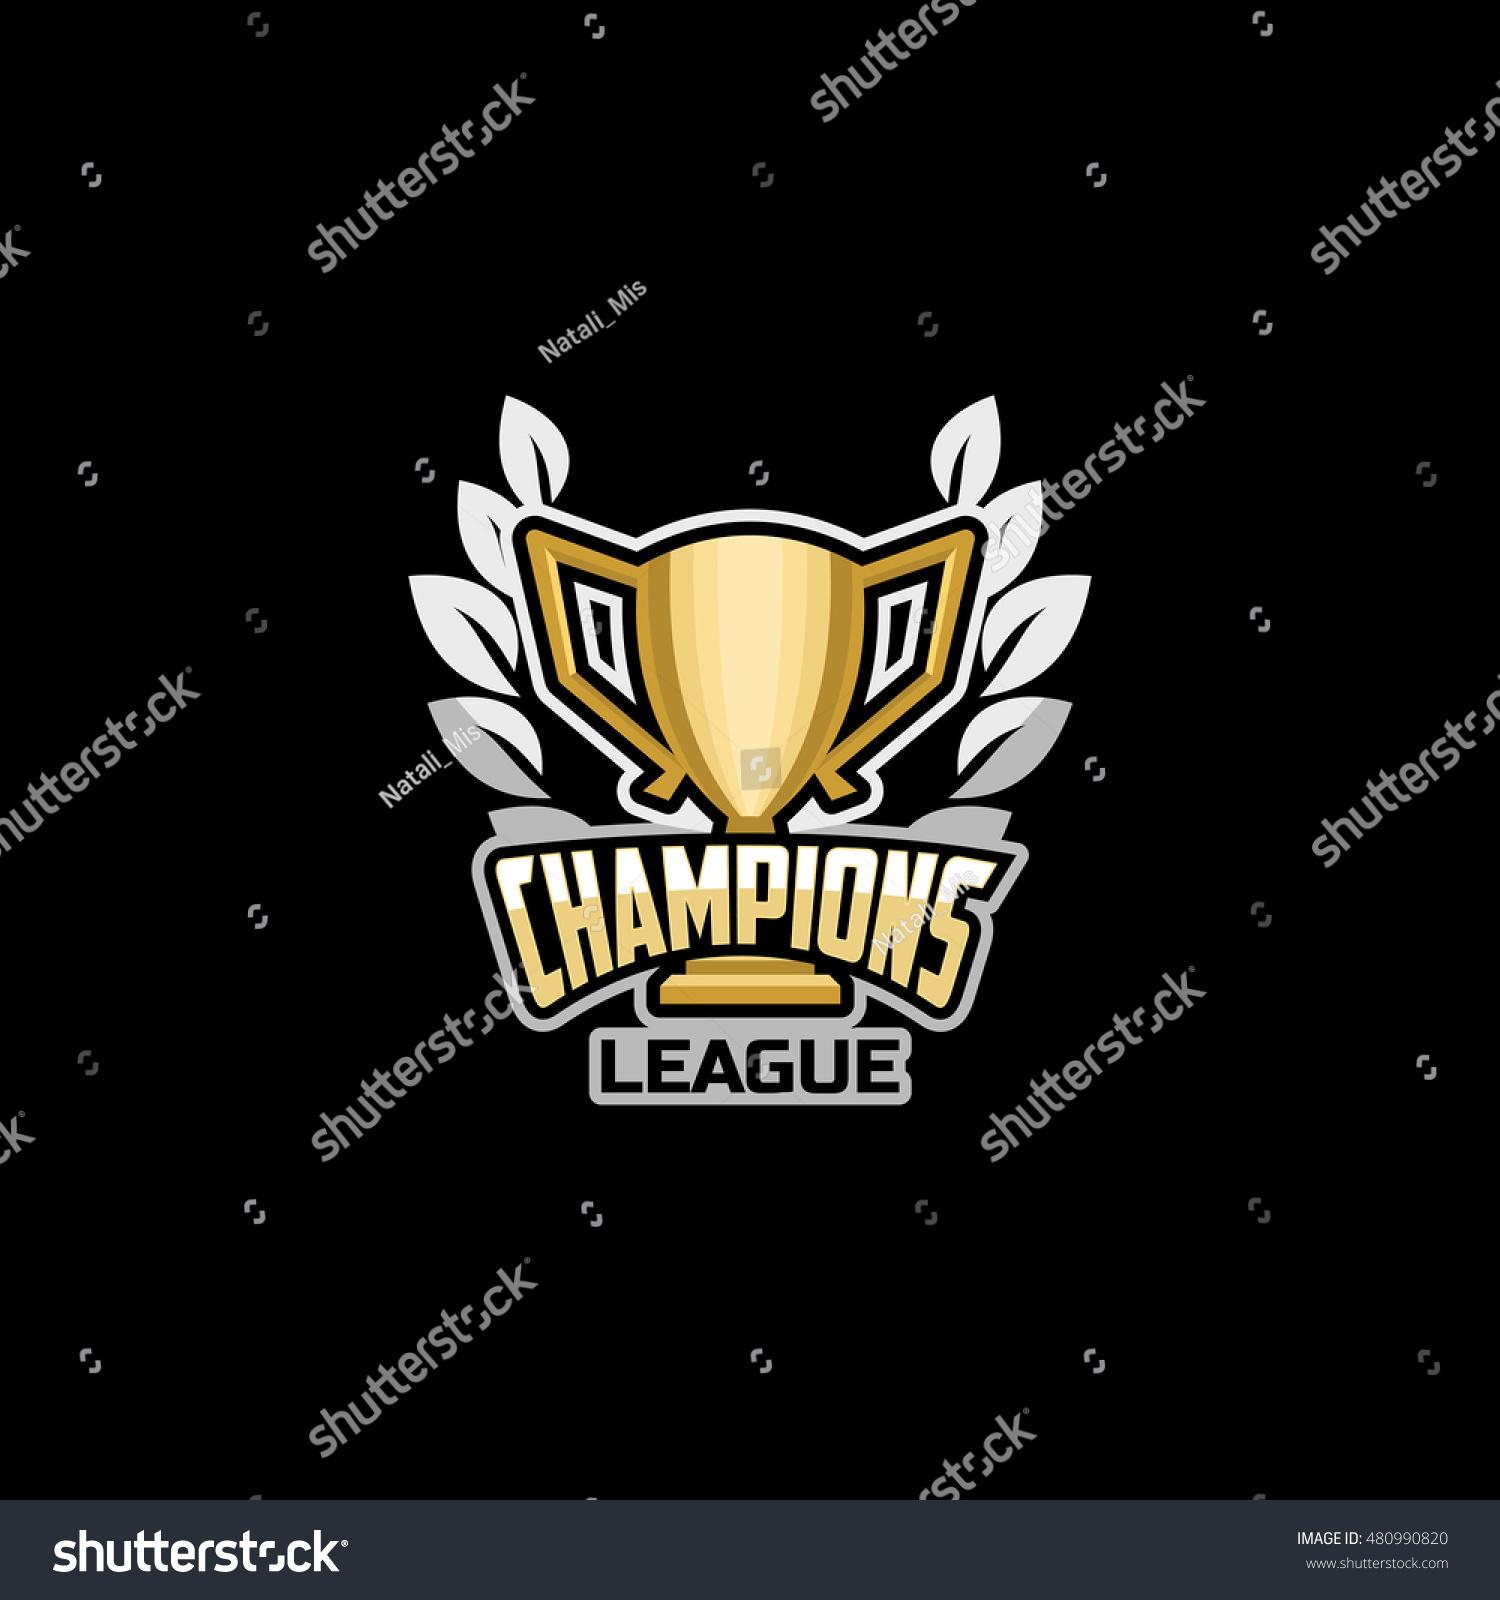 Champions League Vector: Champions League Emblem Logo Icon Badge Stock Vector